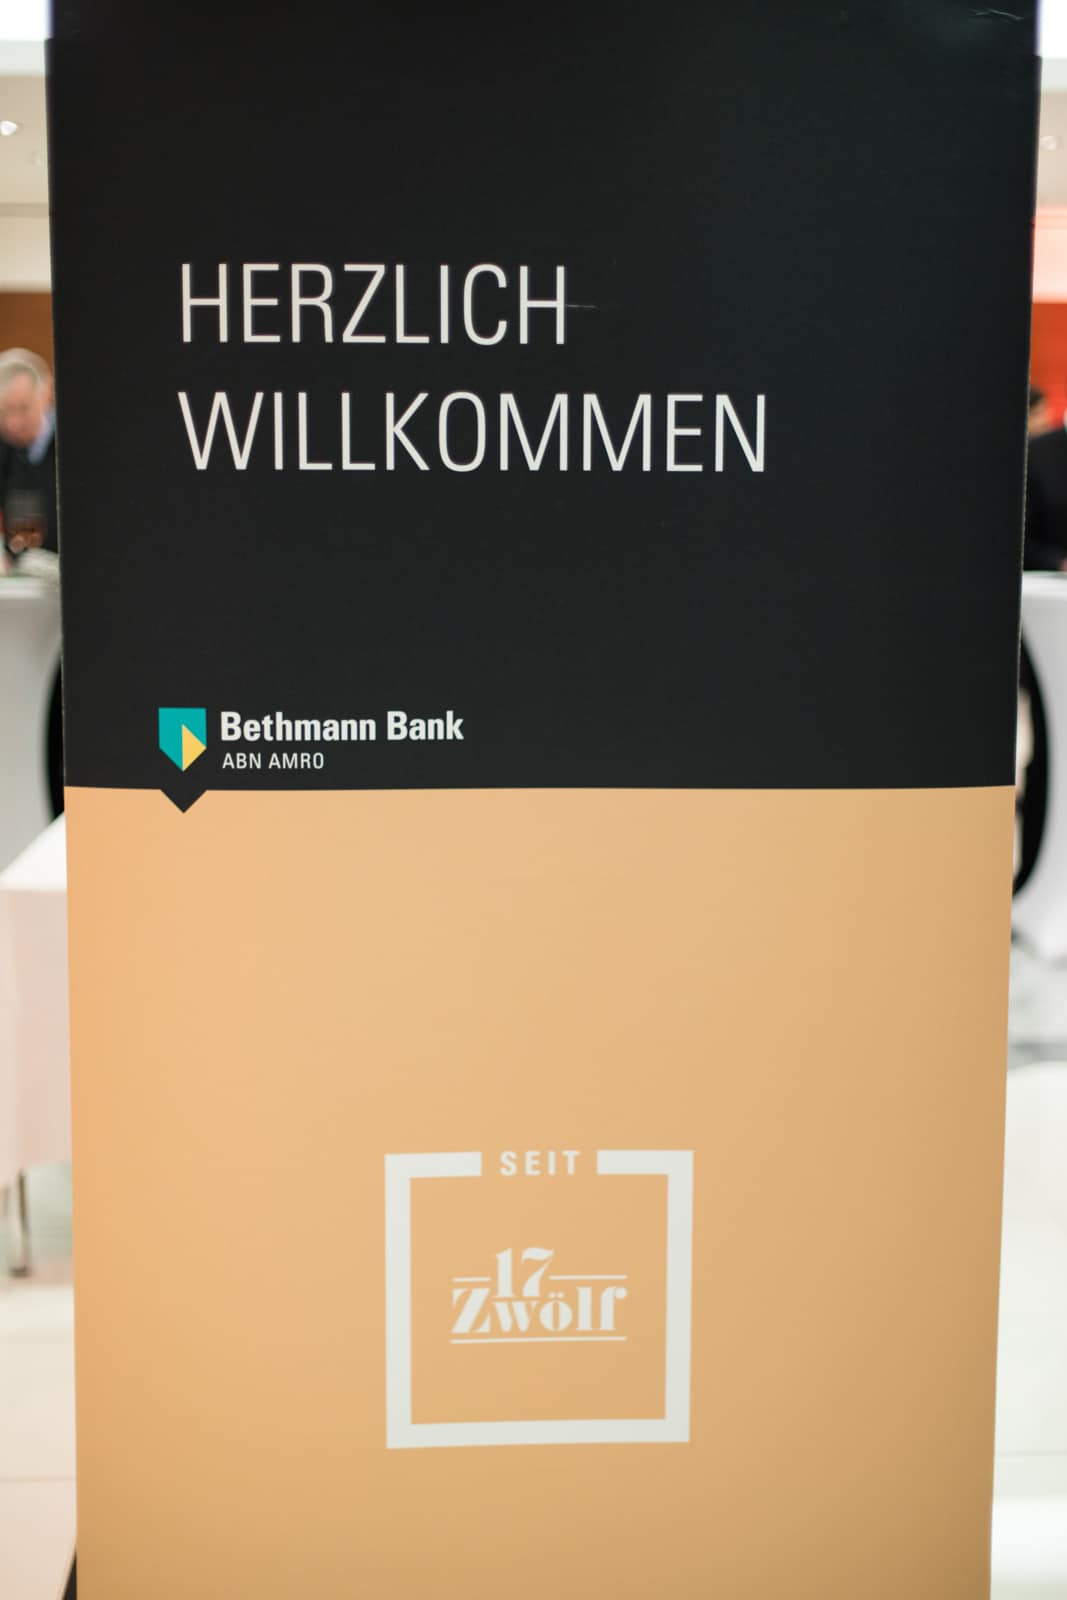 Katharina-Zwerger-Fotograf-CBM-Christoffel-Blindenmission-Stiftungsevent-Frankfurt-Gewerbefotograf-Eventfotograf-timeescape-darmstadt-frankfurt